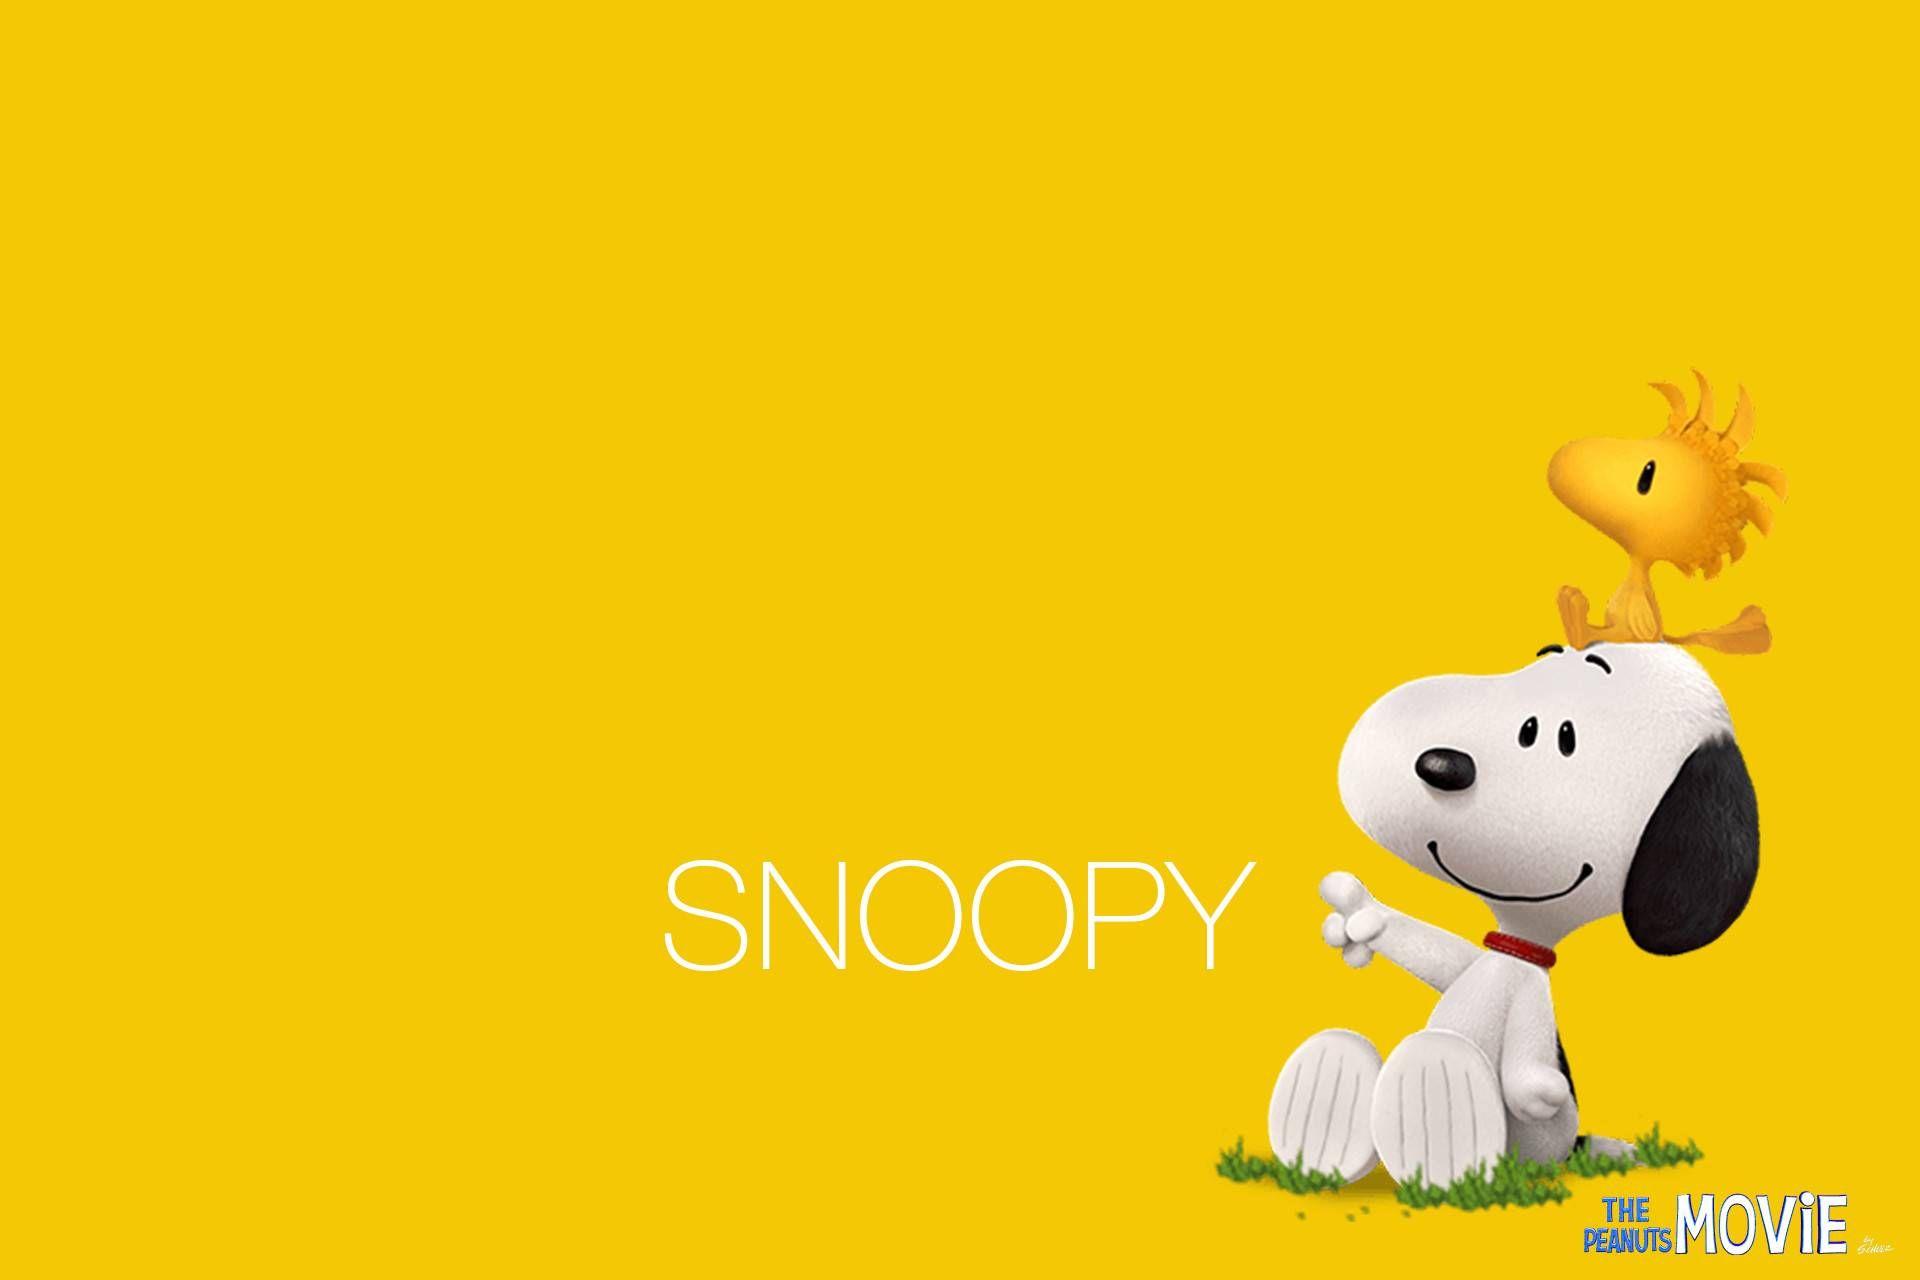 Snoopy Wallpapers Hd Desktop Wallpaper Box Snoopy Wallpaper Snoopy Images Cartoon Wallpaper